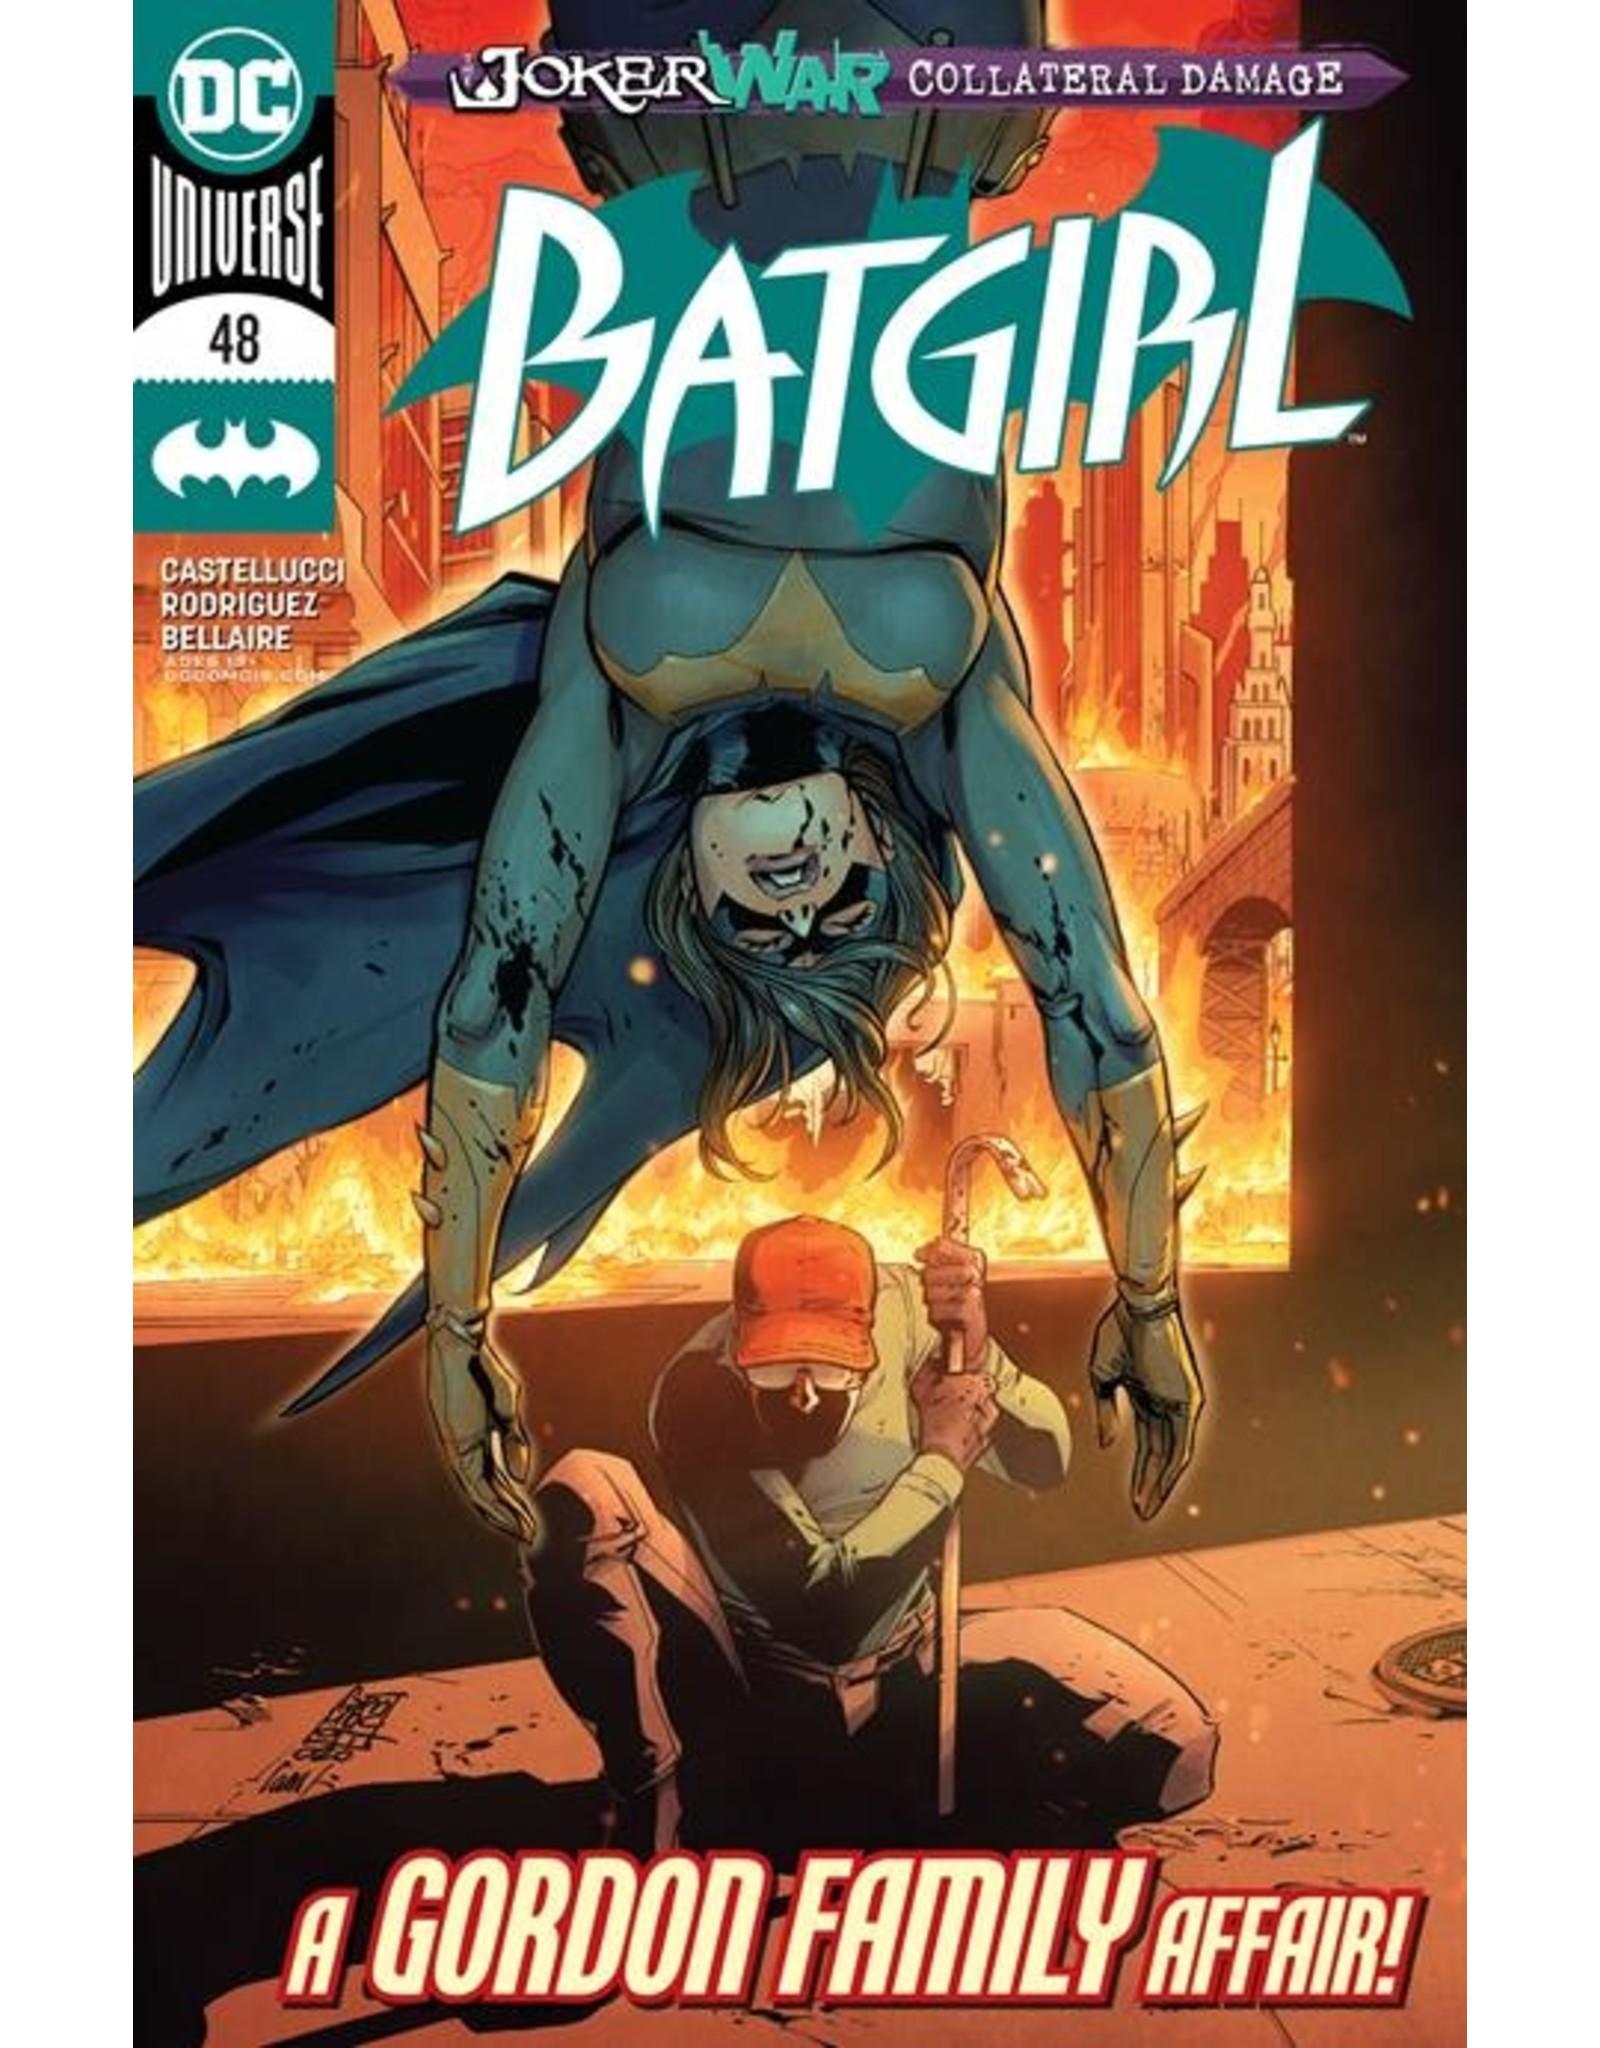 DC COMICS BATGIRL #48 JOKER WAR